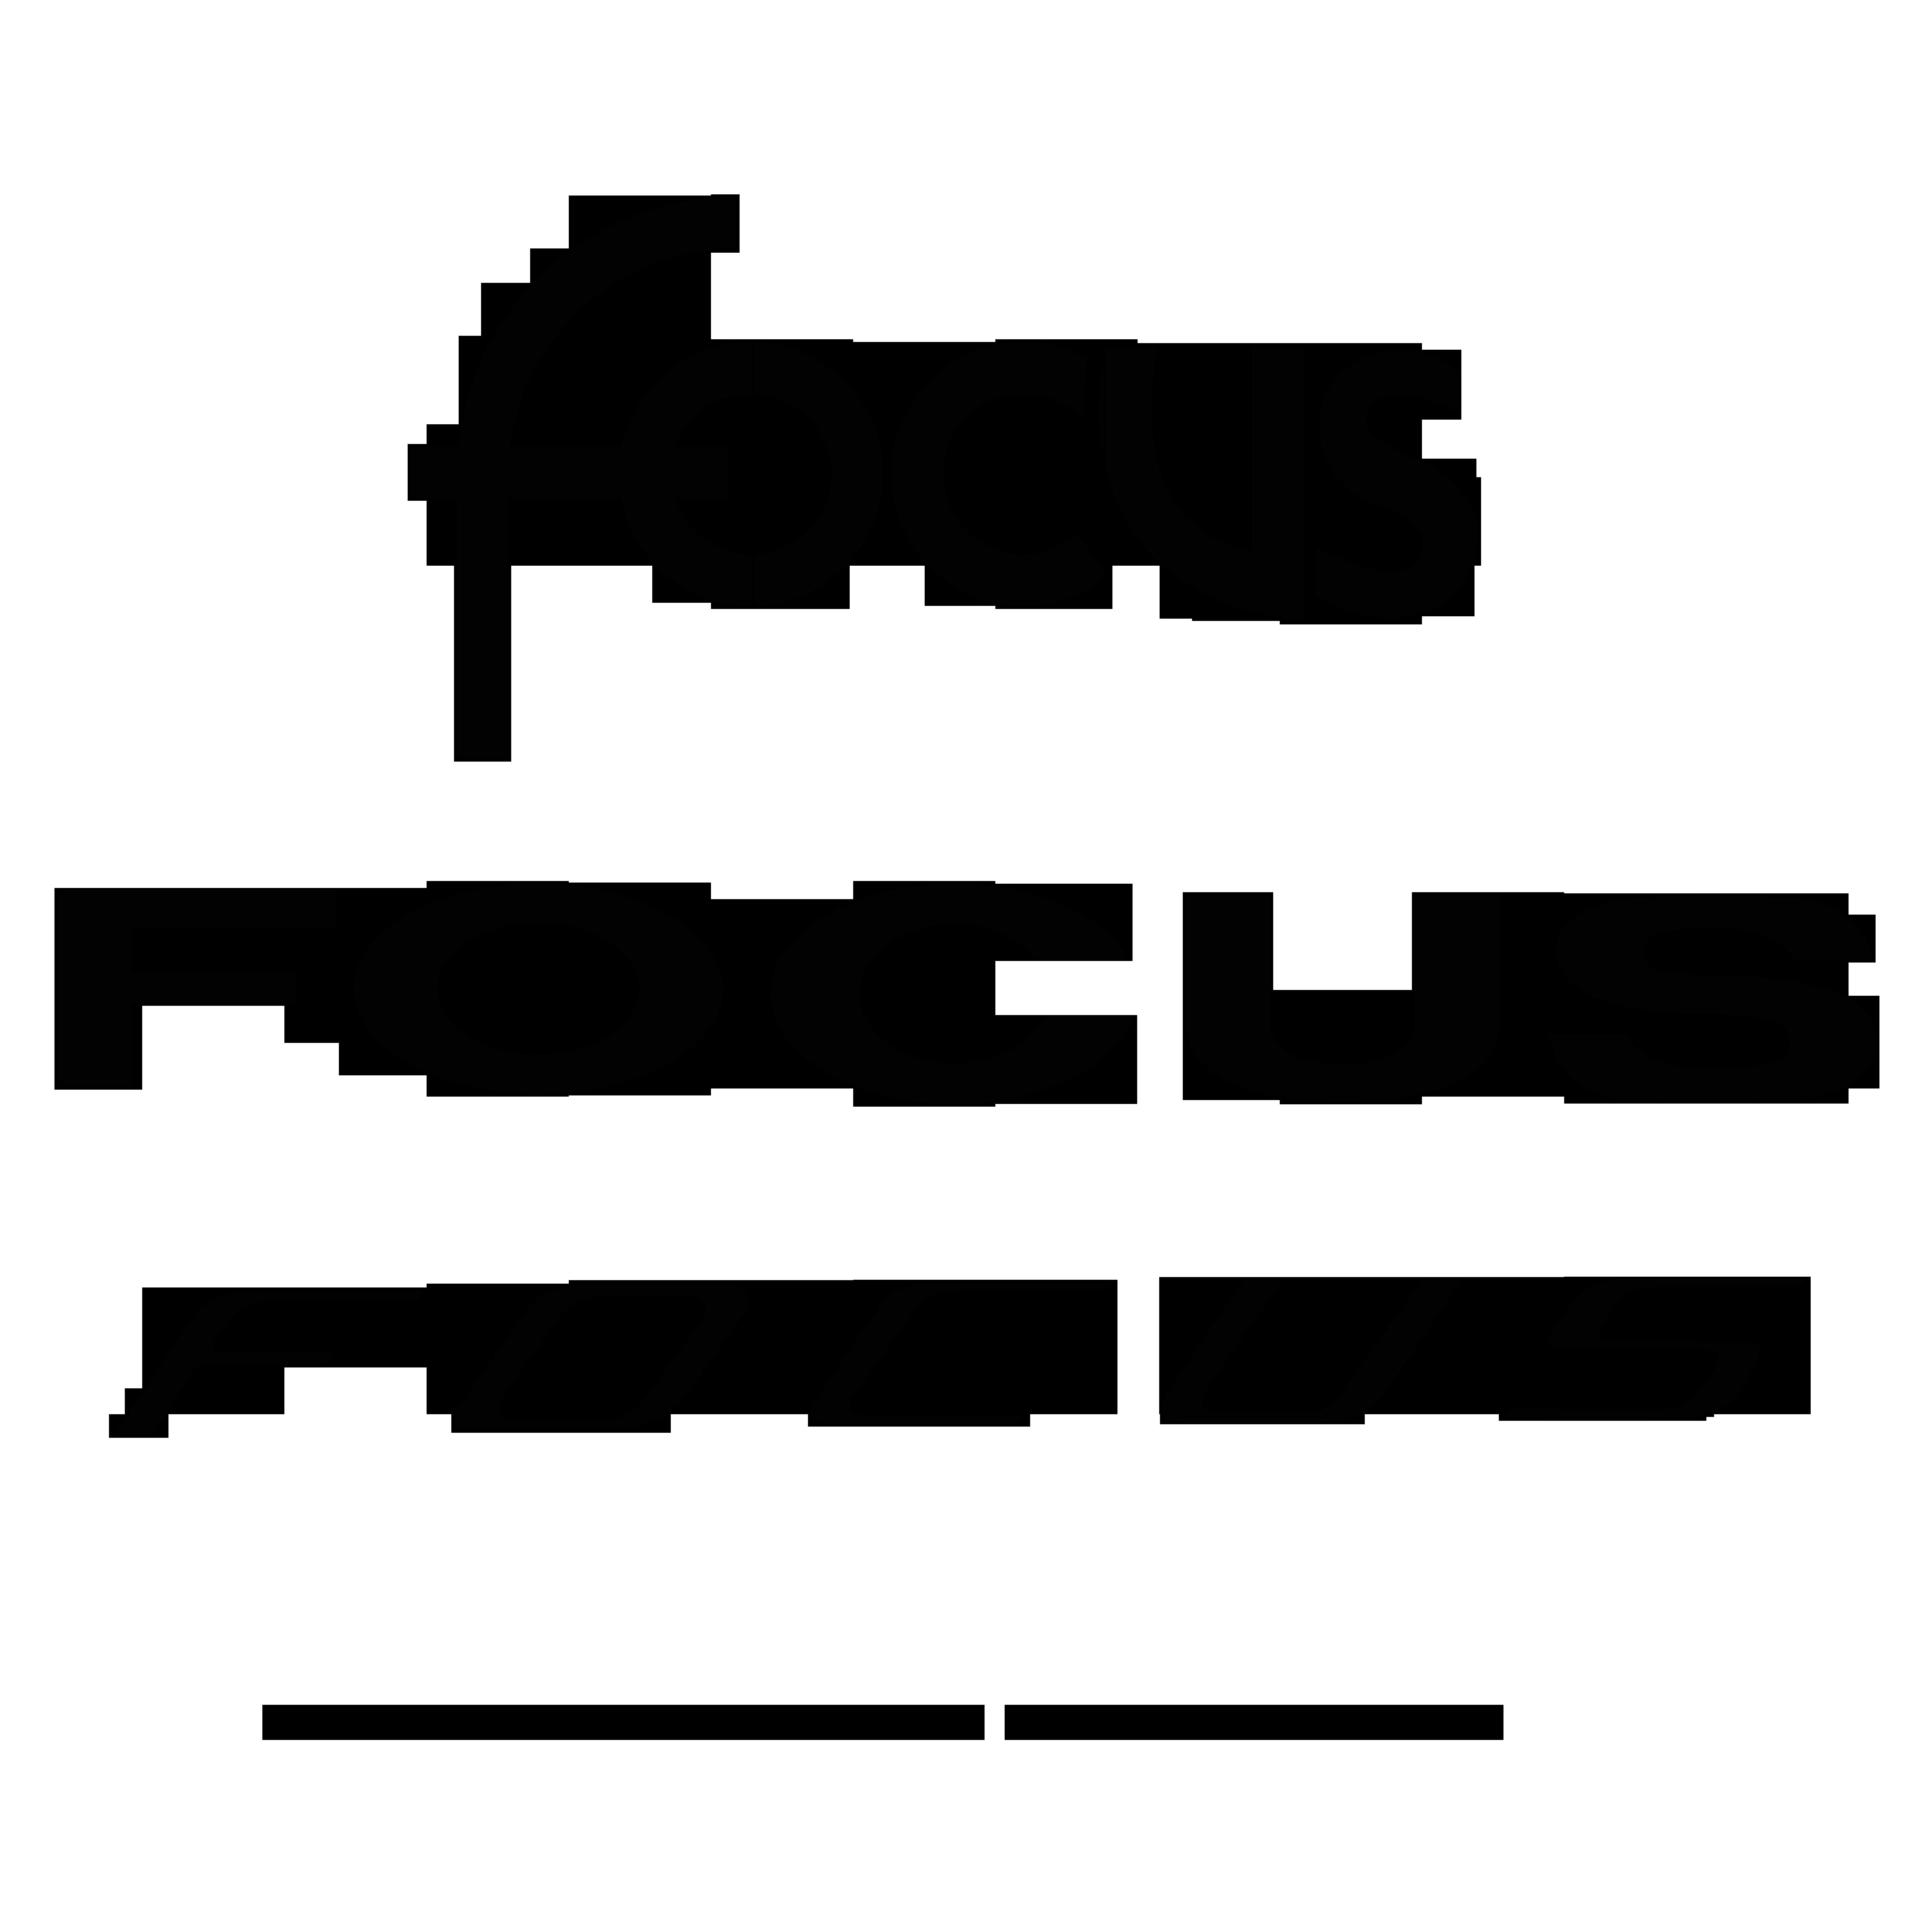 5000x5000 Ford Focus Vector Logos Freds Focus